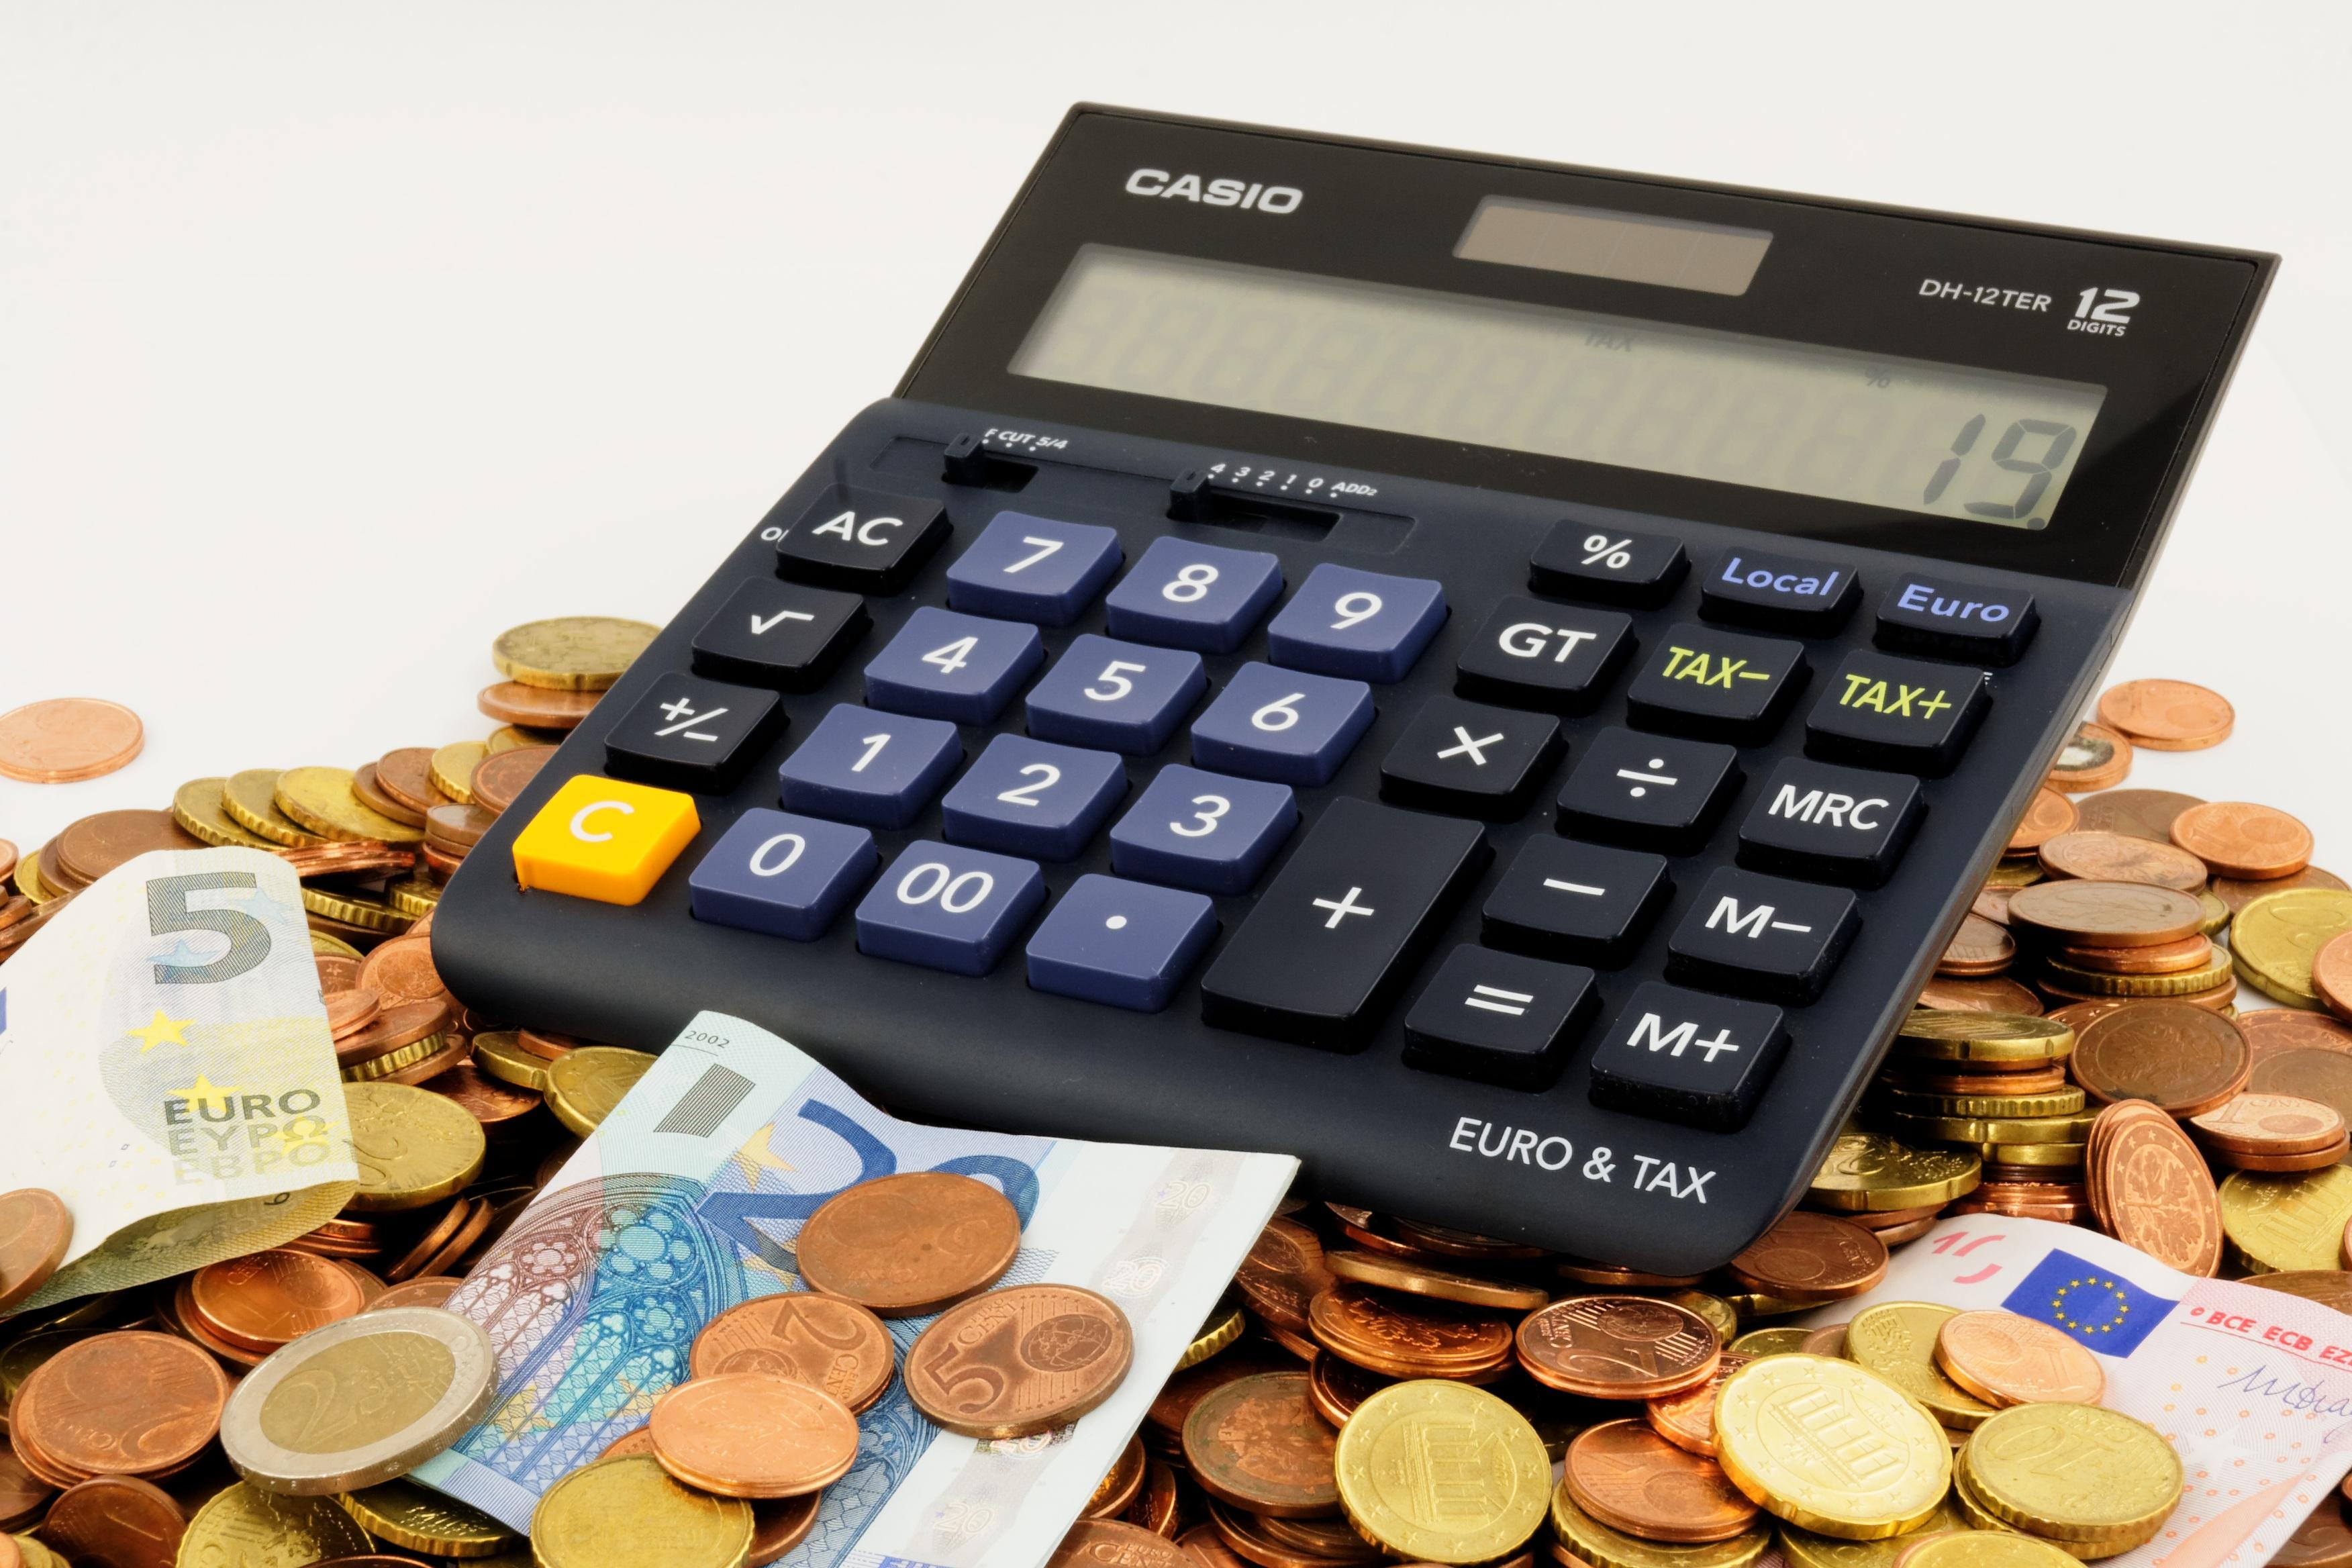 https://www.pexels.com/de/foto/geld-taschenrechner-cents-munzen-34502/